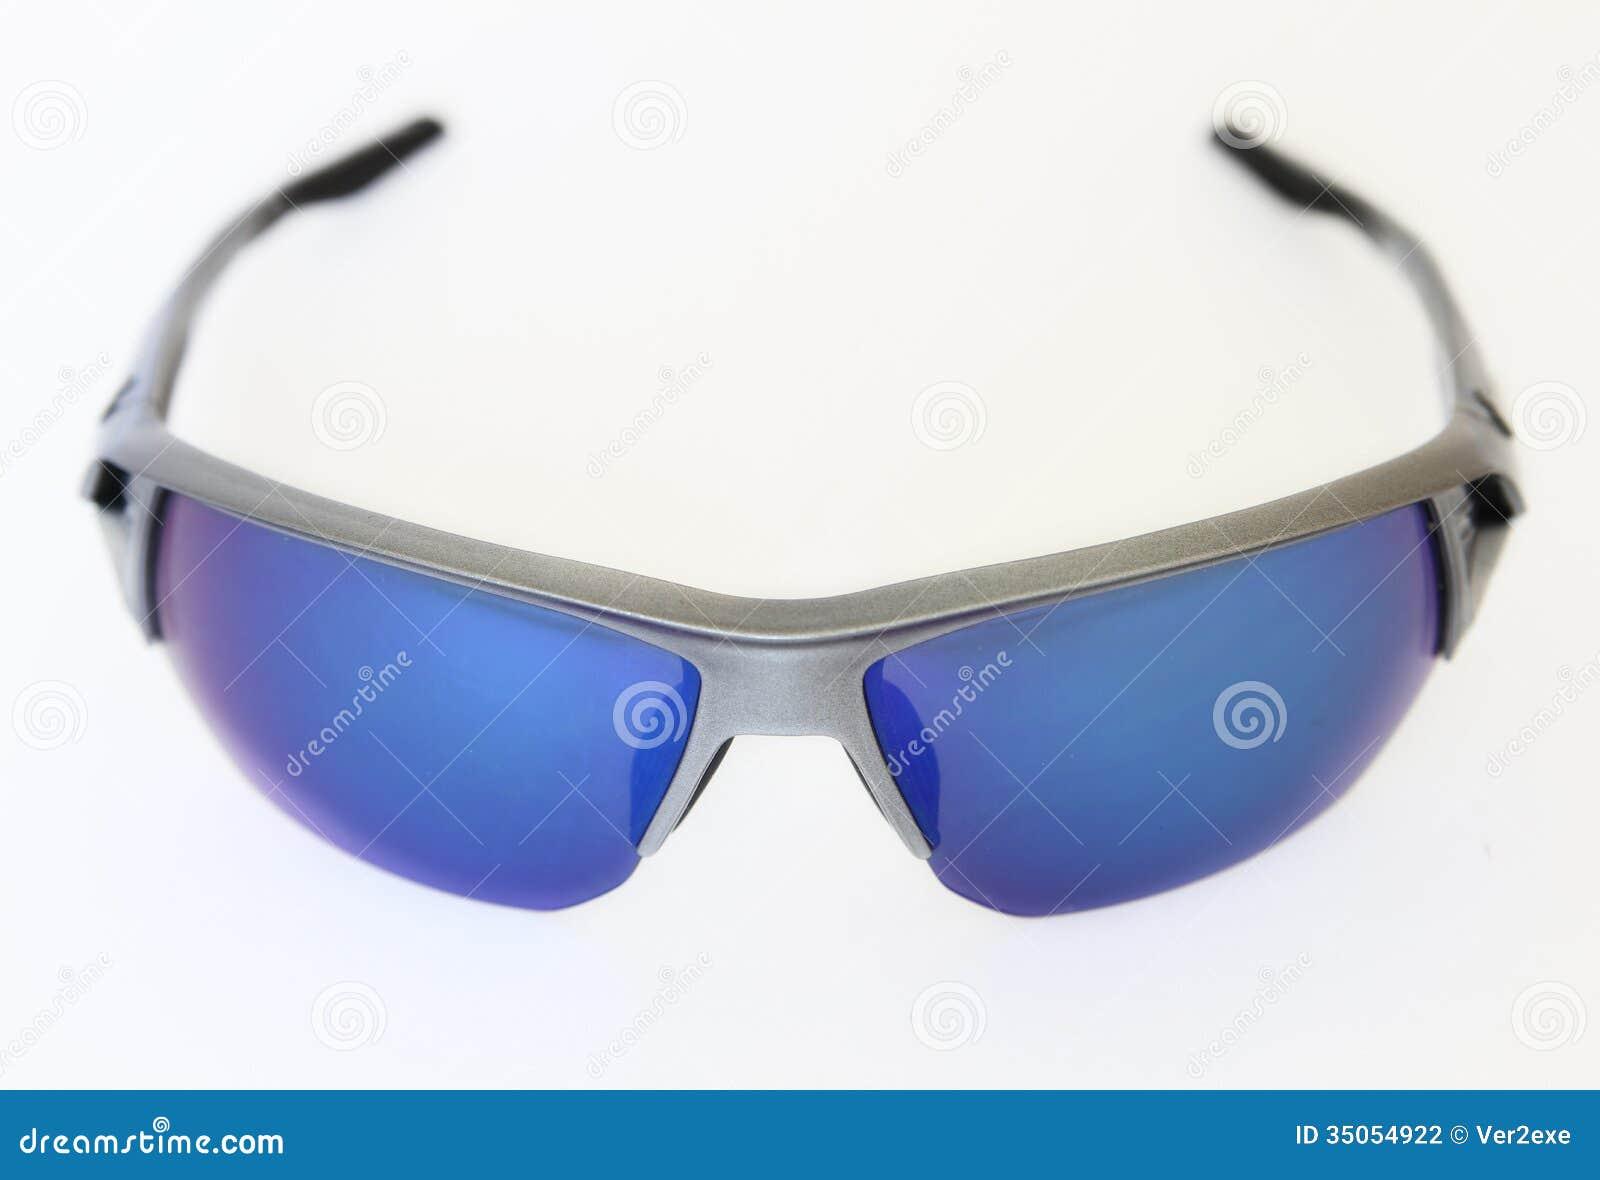 3e19f3f140 Αθλητικά γυαλιά ηλίου στοκ εικόνες. εικόνα από ζευγάρι - 35054922